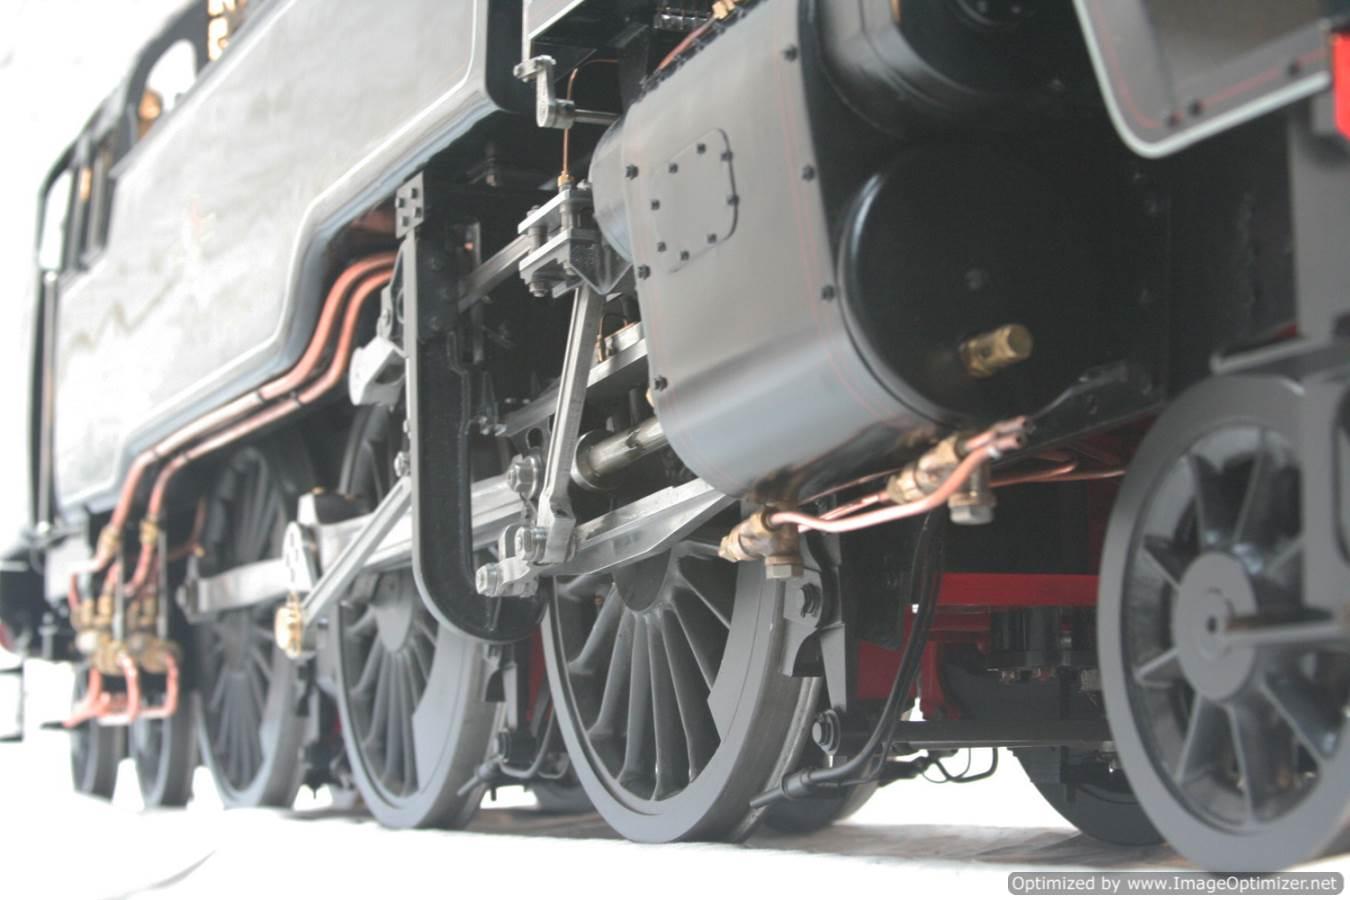 test br-standard-class-4-tank-live-steam-model-steam-workshop-rebuild-20-optimized